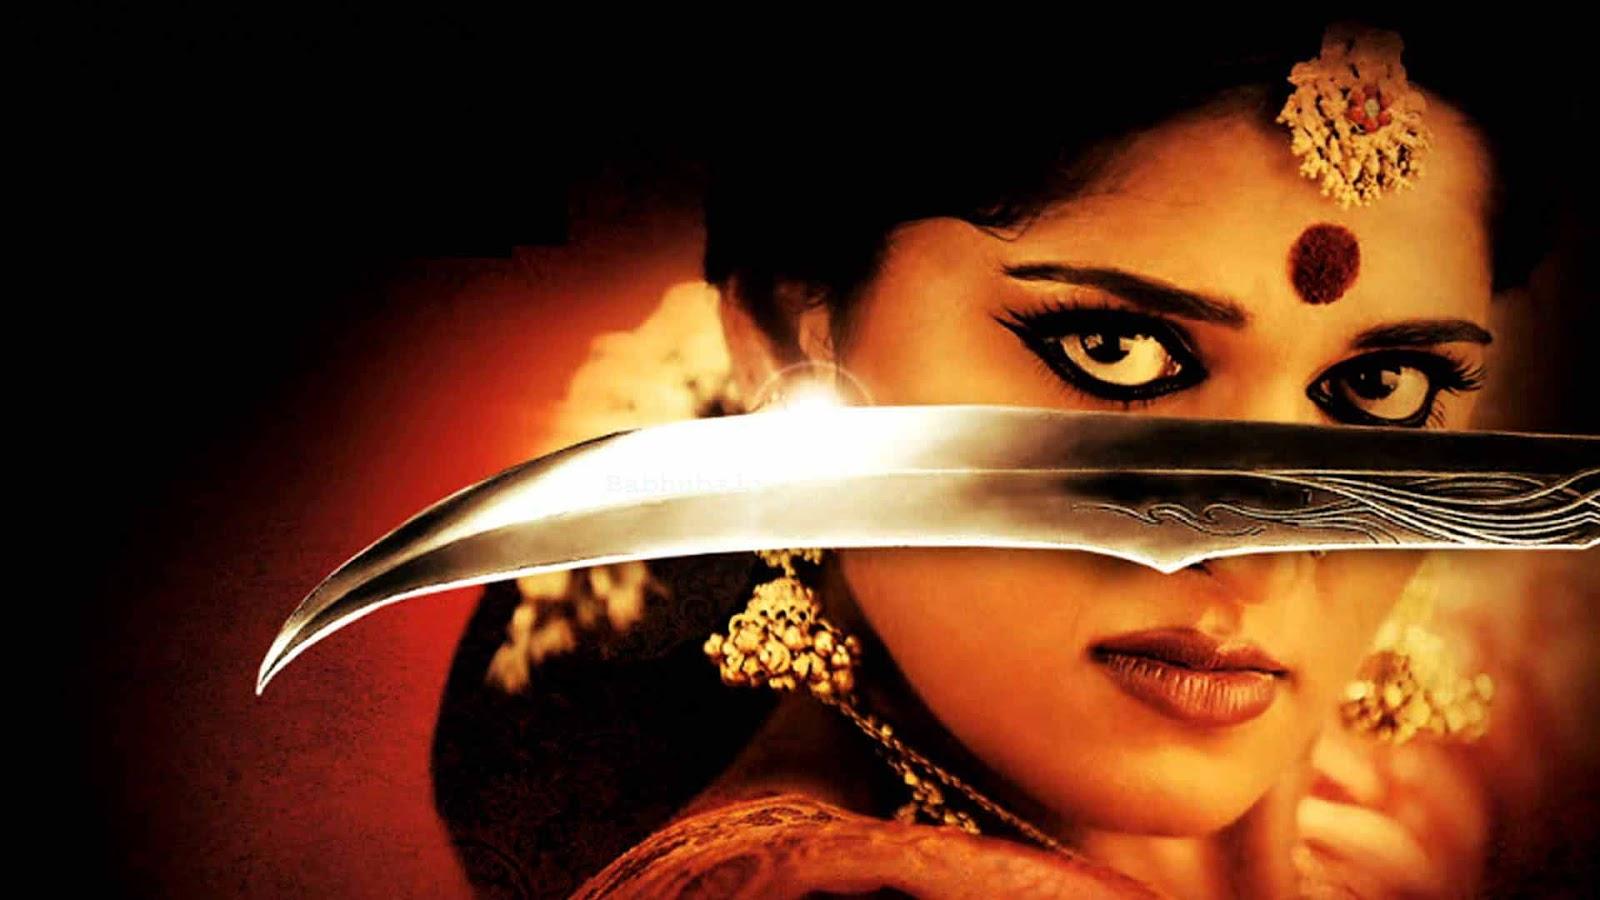 Ba bahubali 2 hd wallpapers - Bahubali 2 Movie Mp3 Songs List